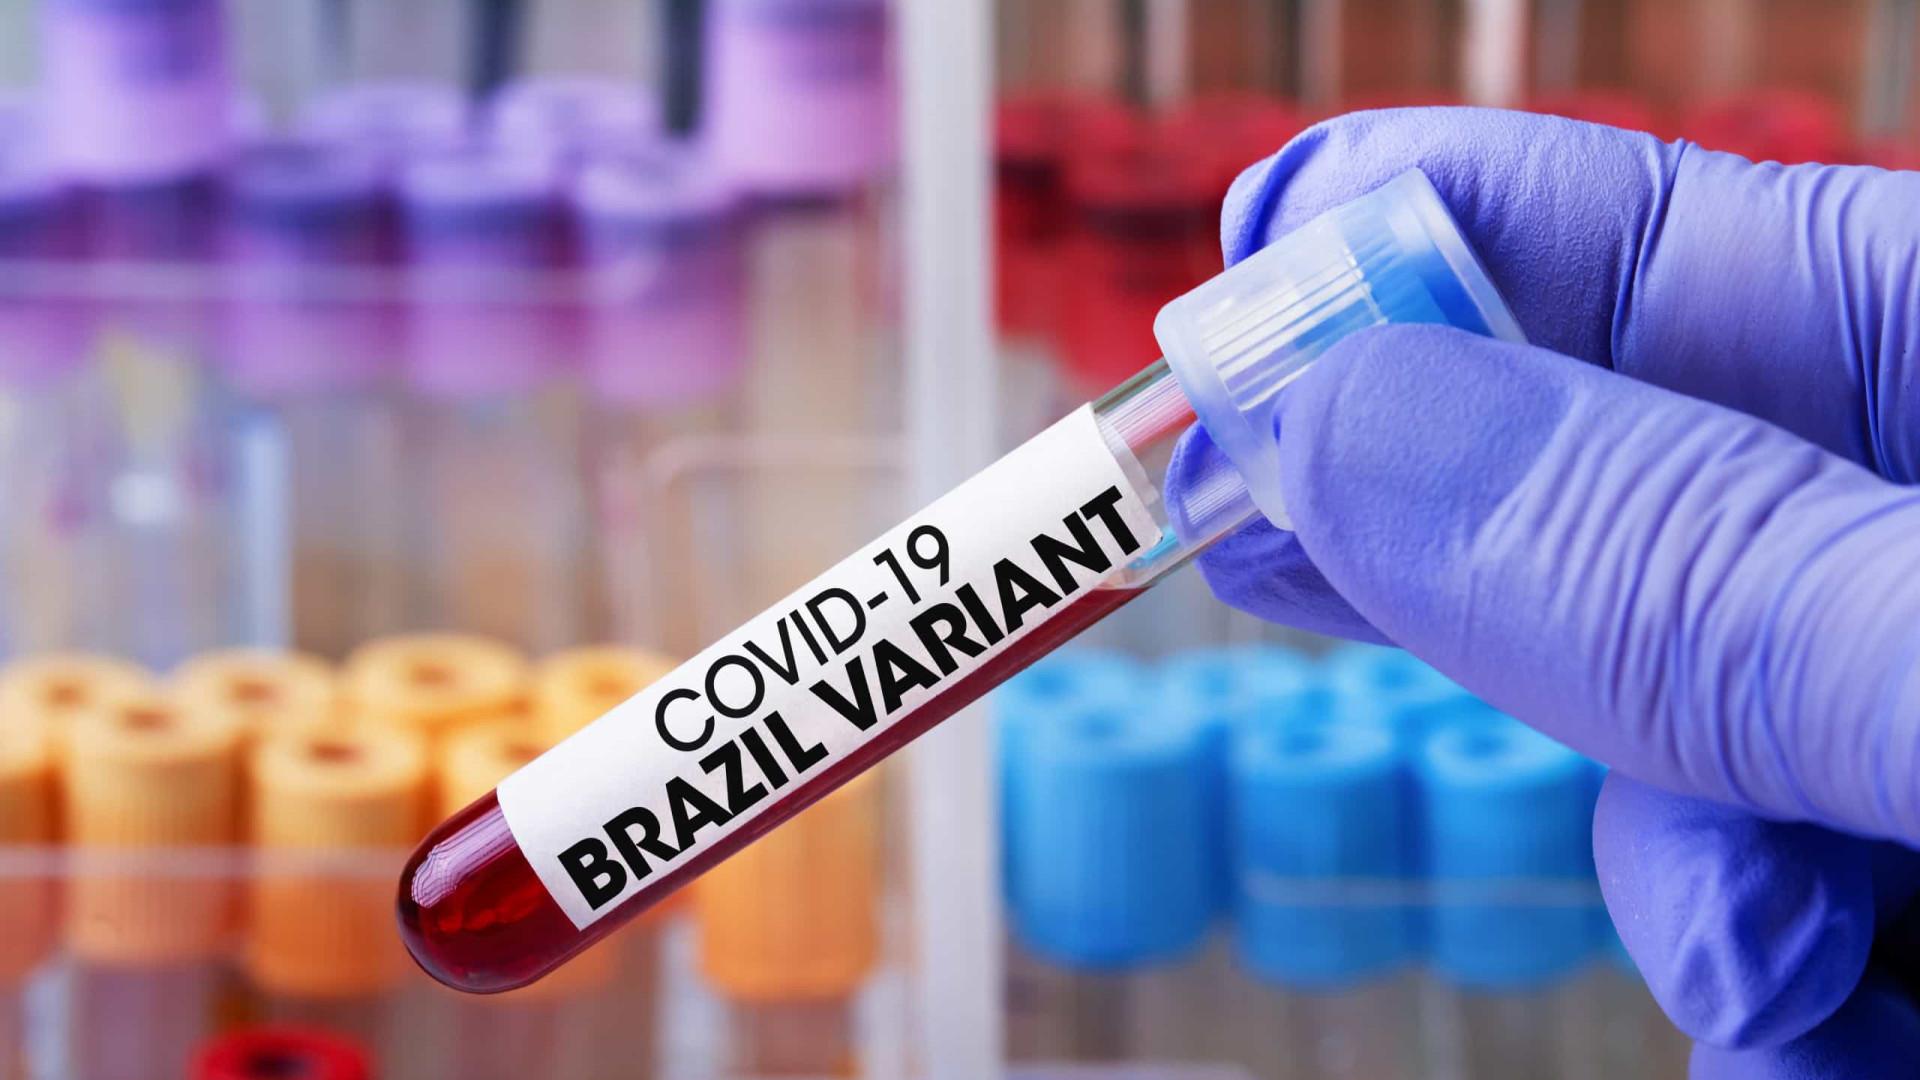 Variante brasileira pode driblar Coronavac, sugere estudo